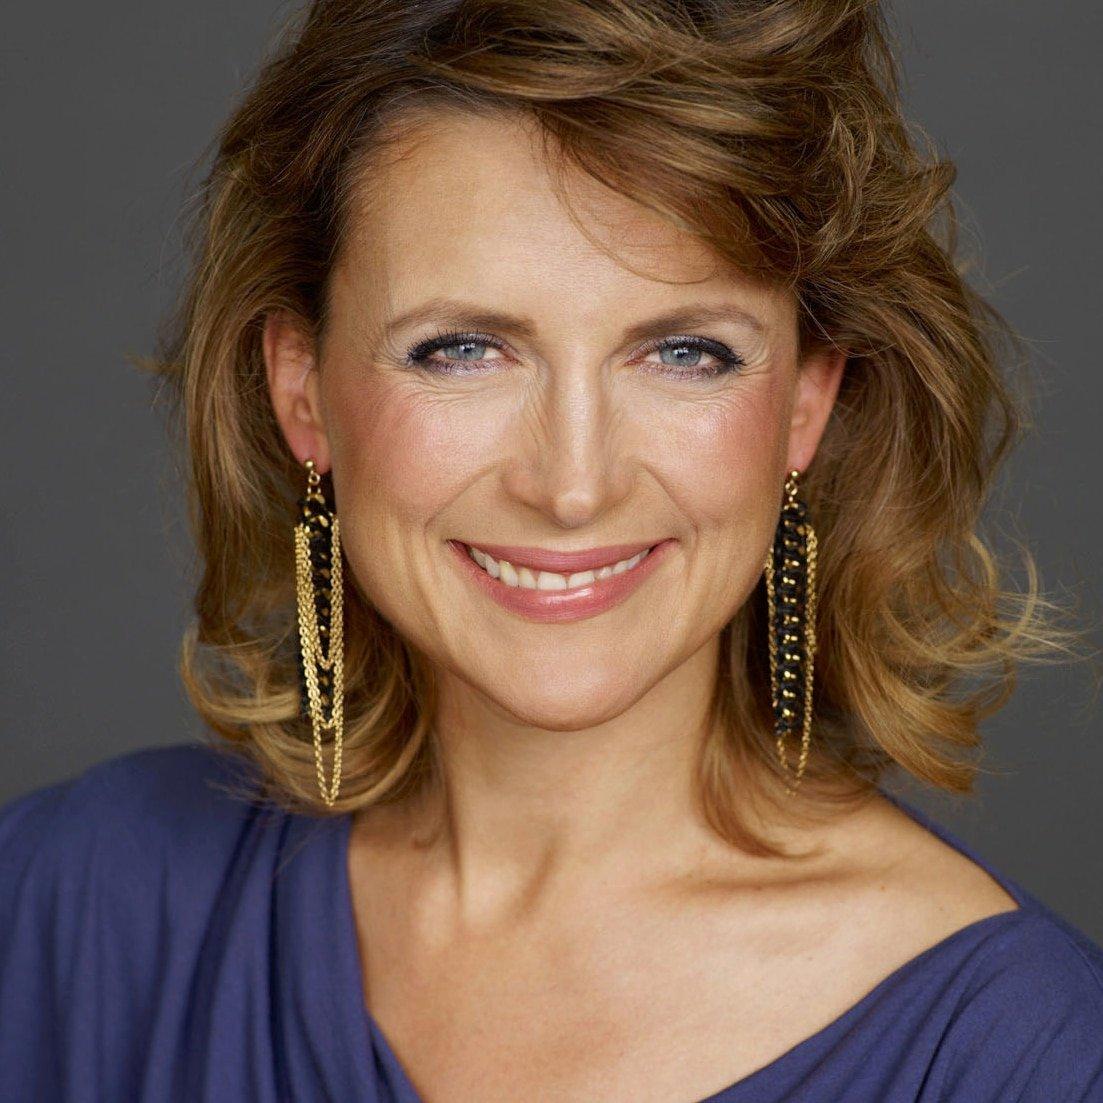 Katie-Derham-radio-TV-Broadcaster-at-Great-British-Speakers